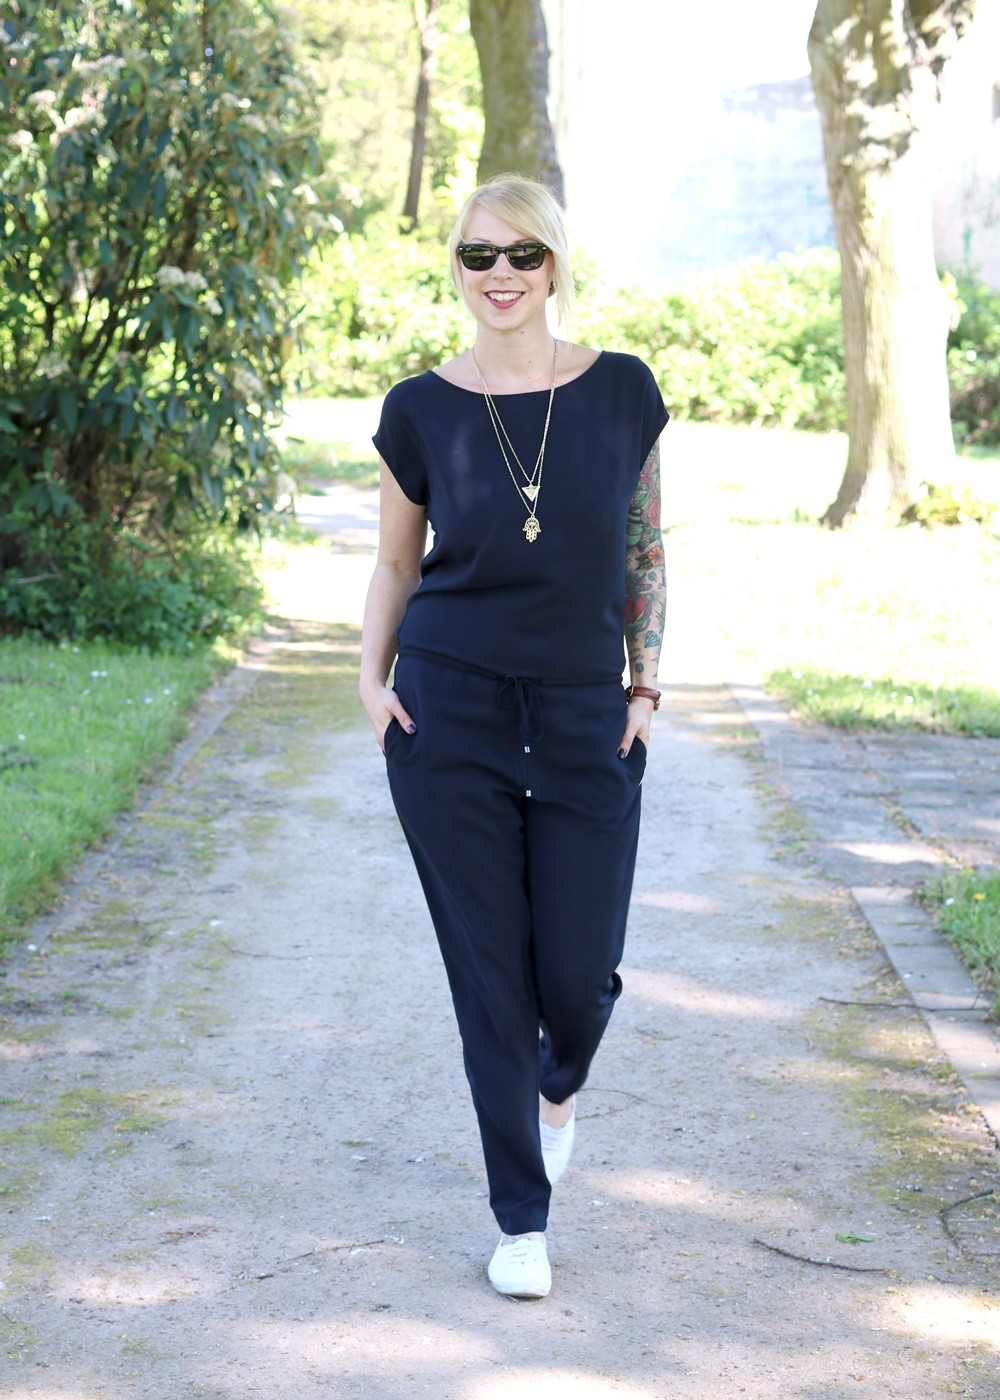 Fashionbloggerin Karlsruhe Outfit Jumpsuit Aldi Jette Joop Daniel Wellington Dapper (2)